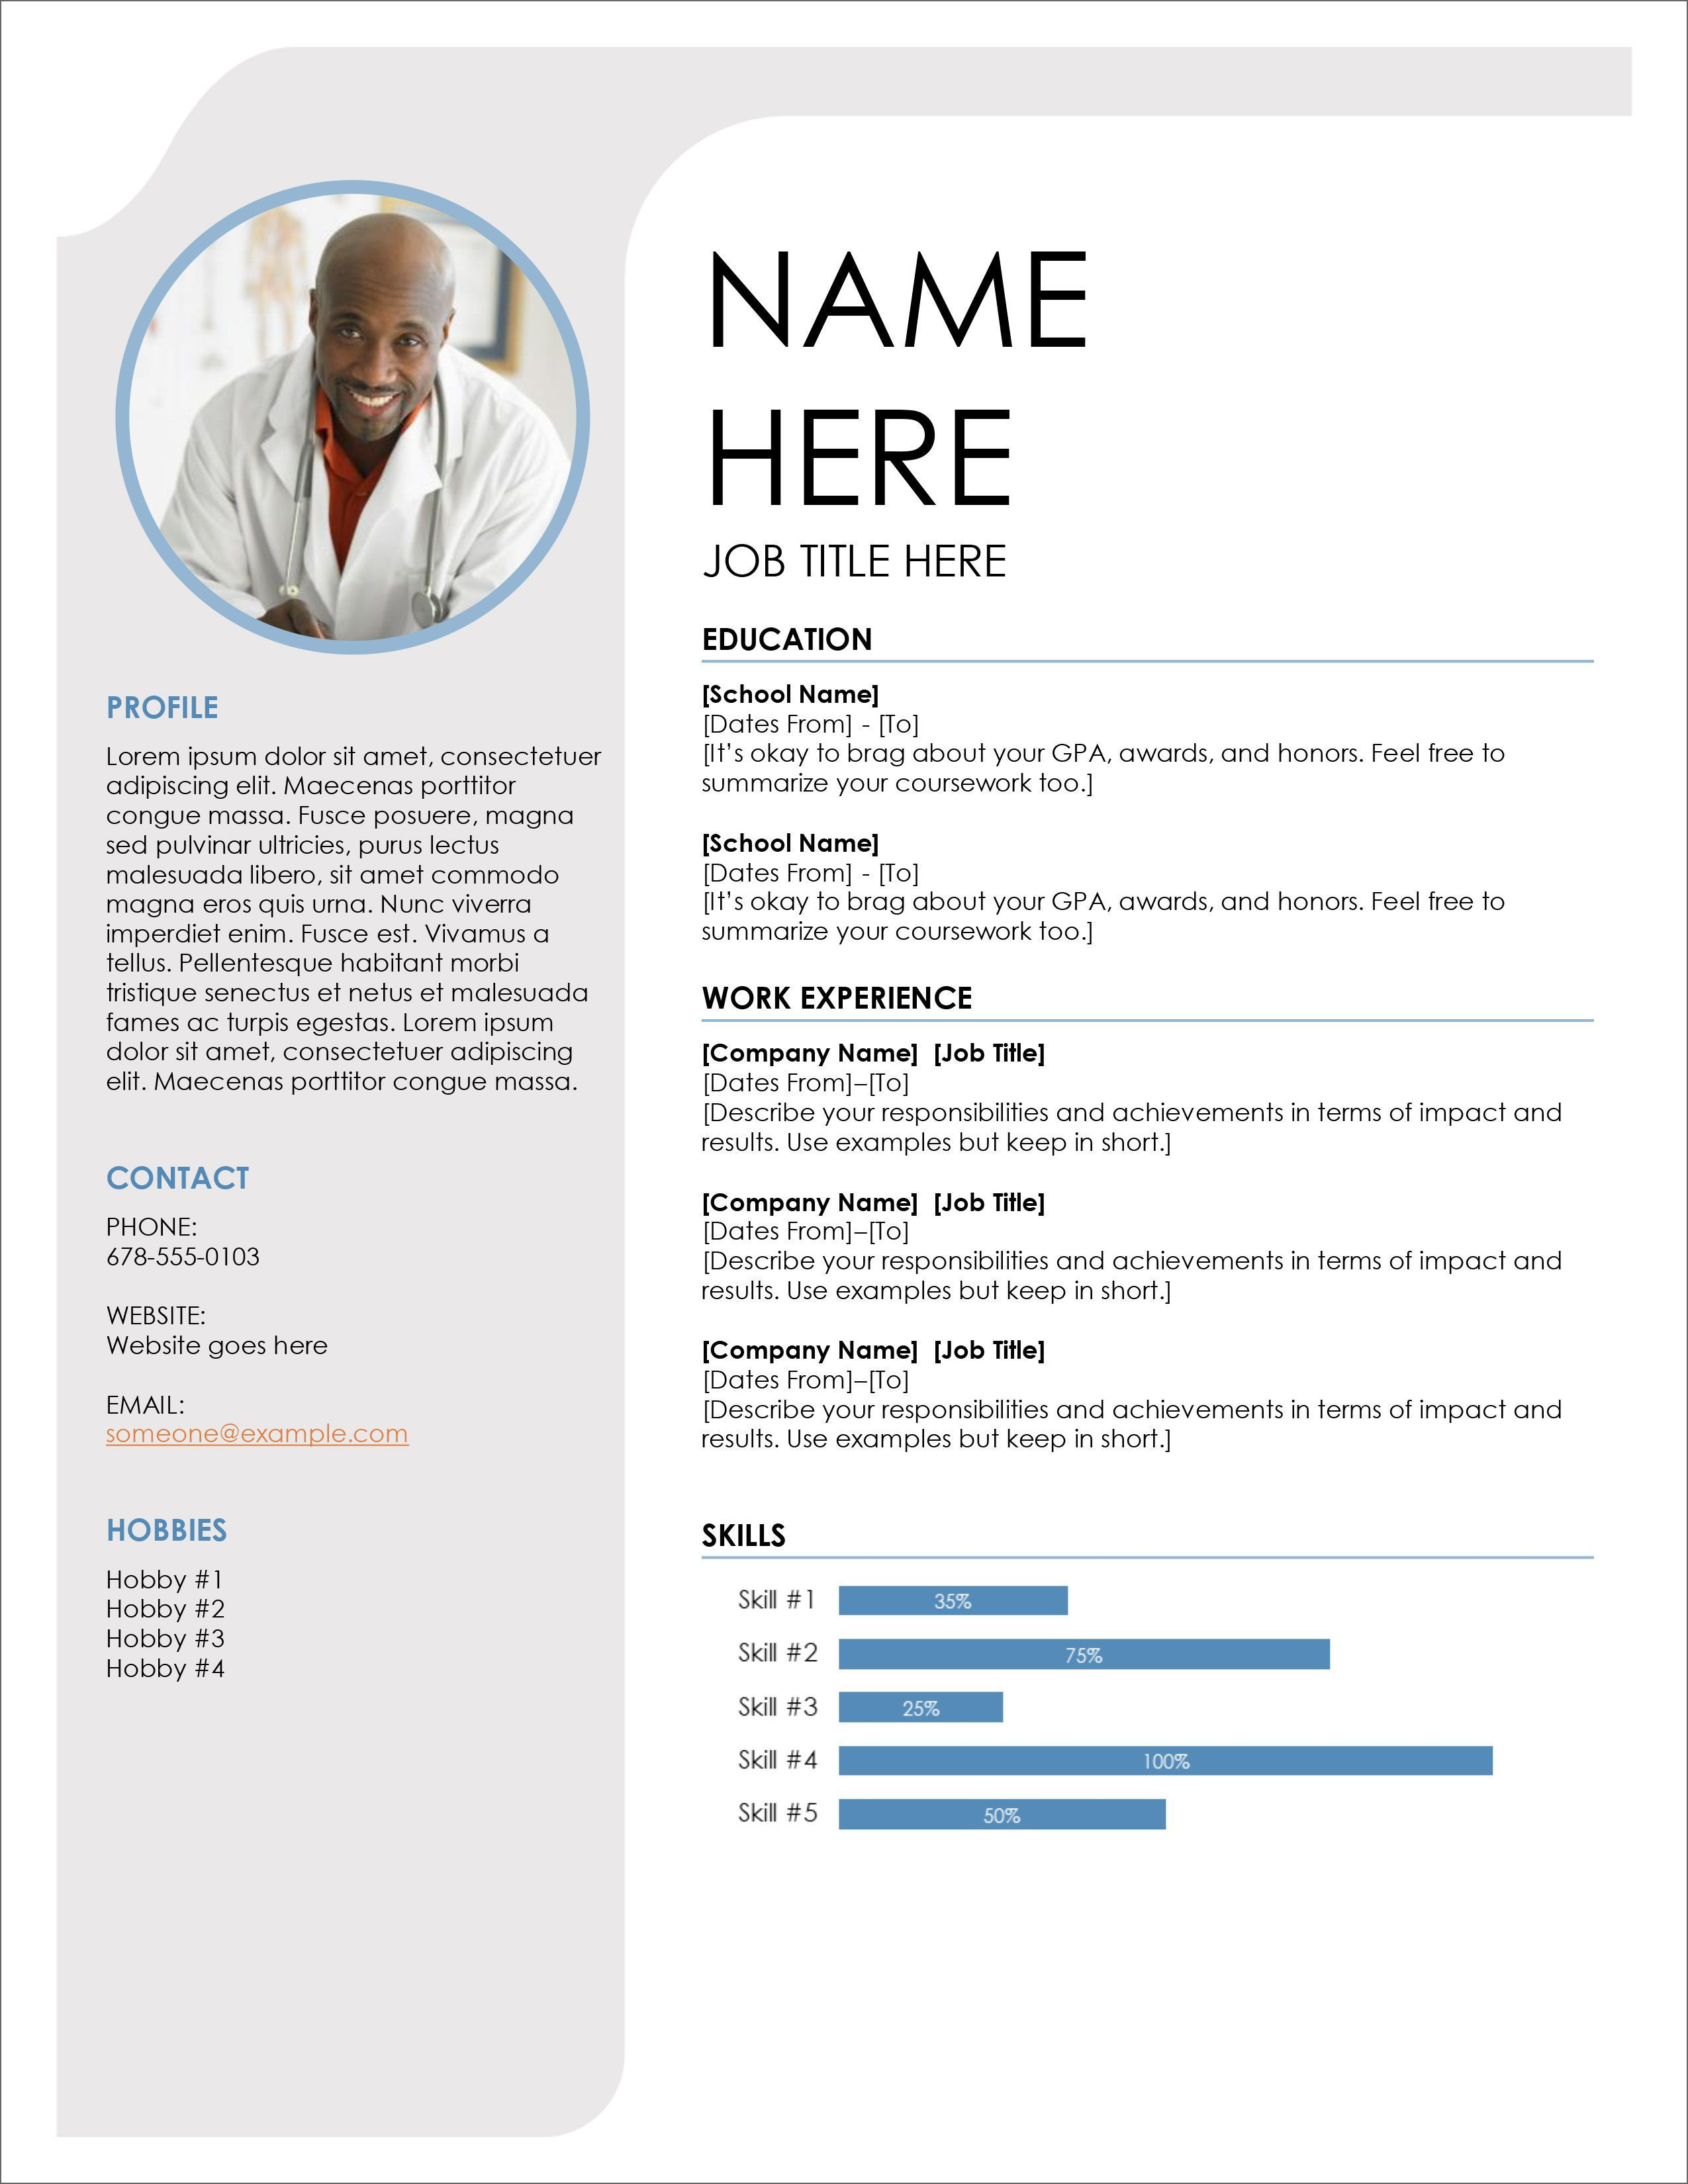 007 Amazing Resume Format Example Free Download Idea Full